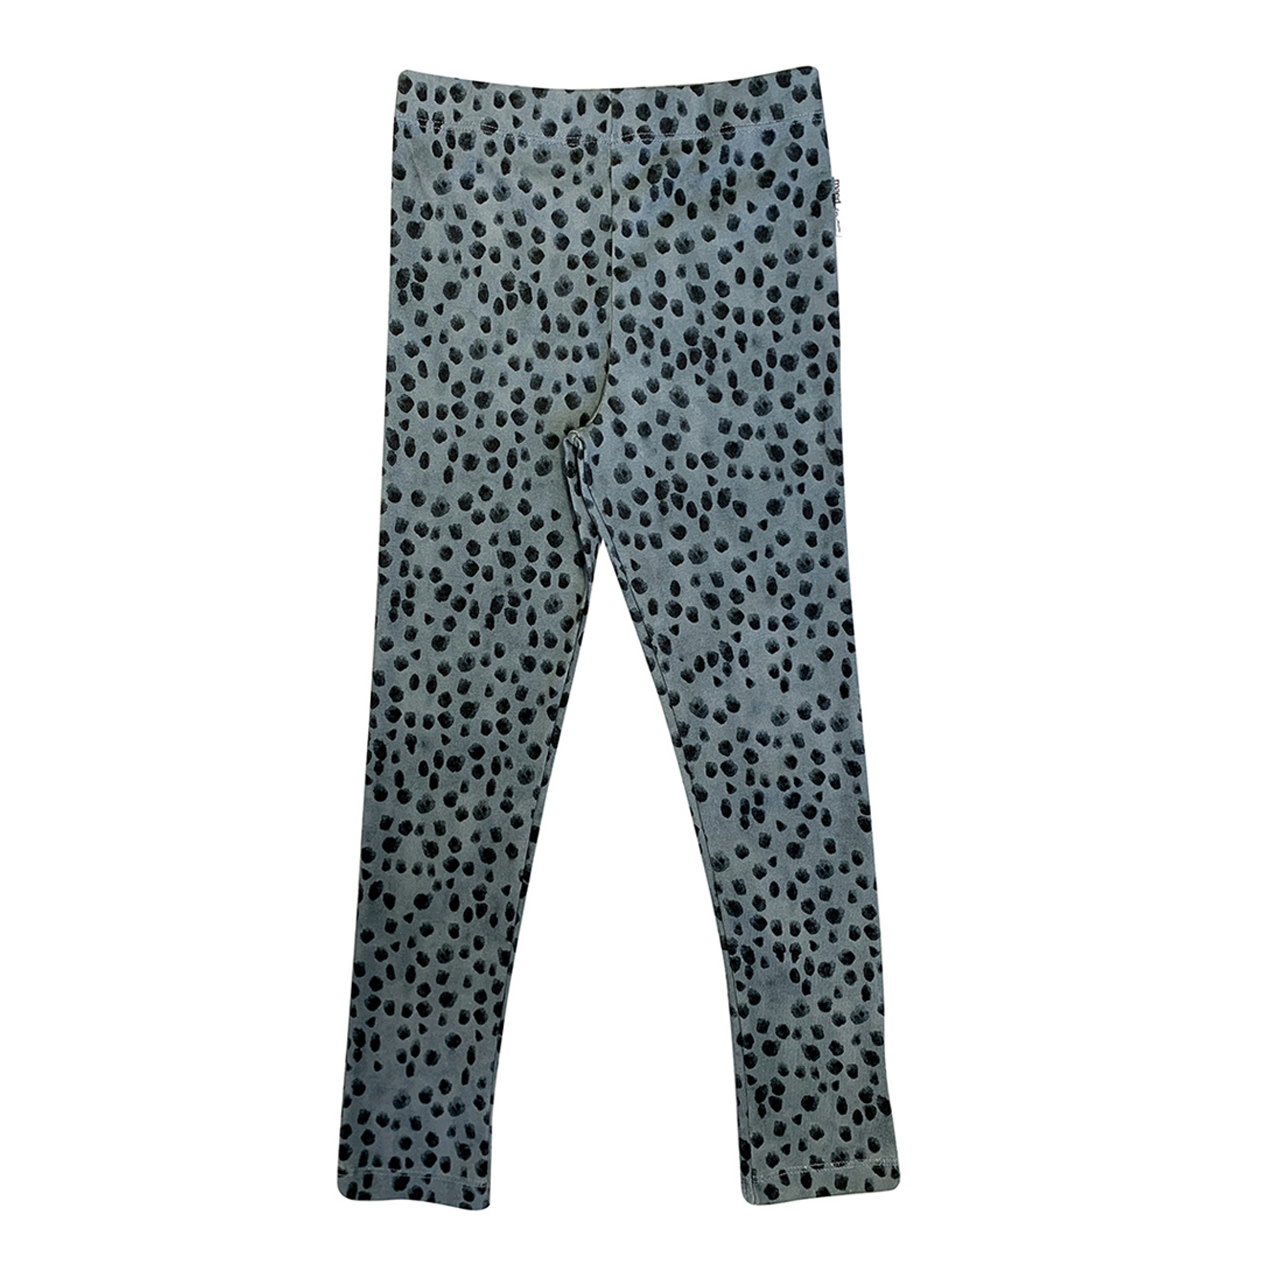 Maed for mini Lazy leopard | legging